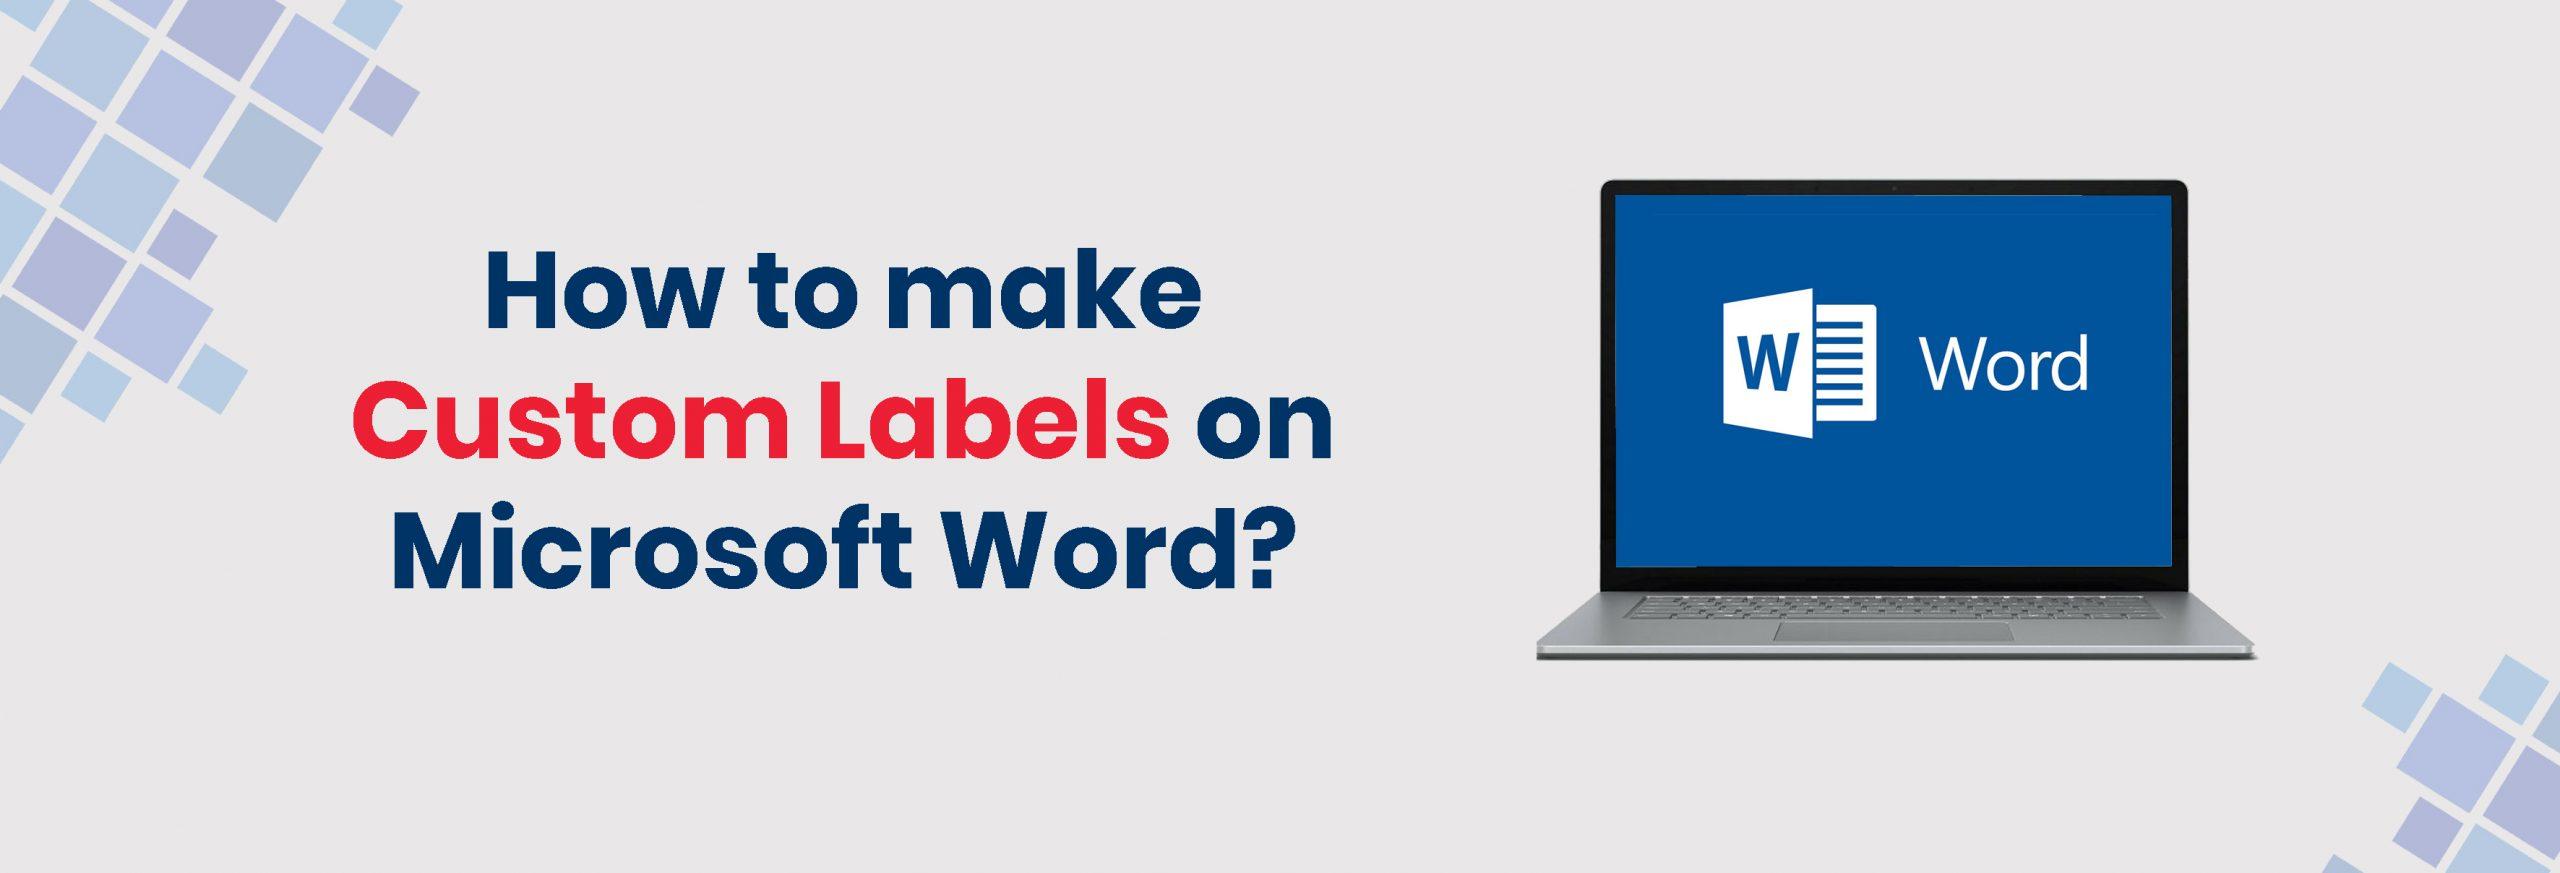 How to Make Custom Labels on Microsoft Word